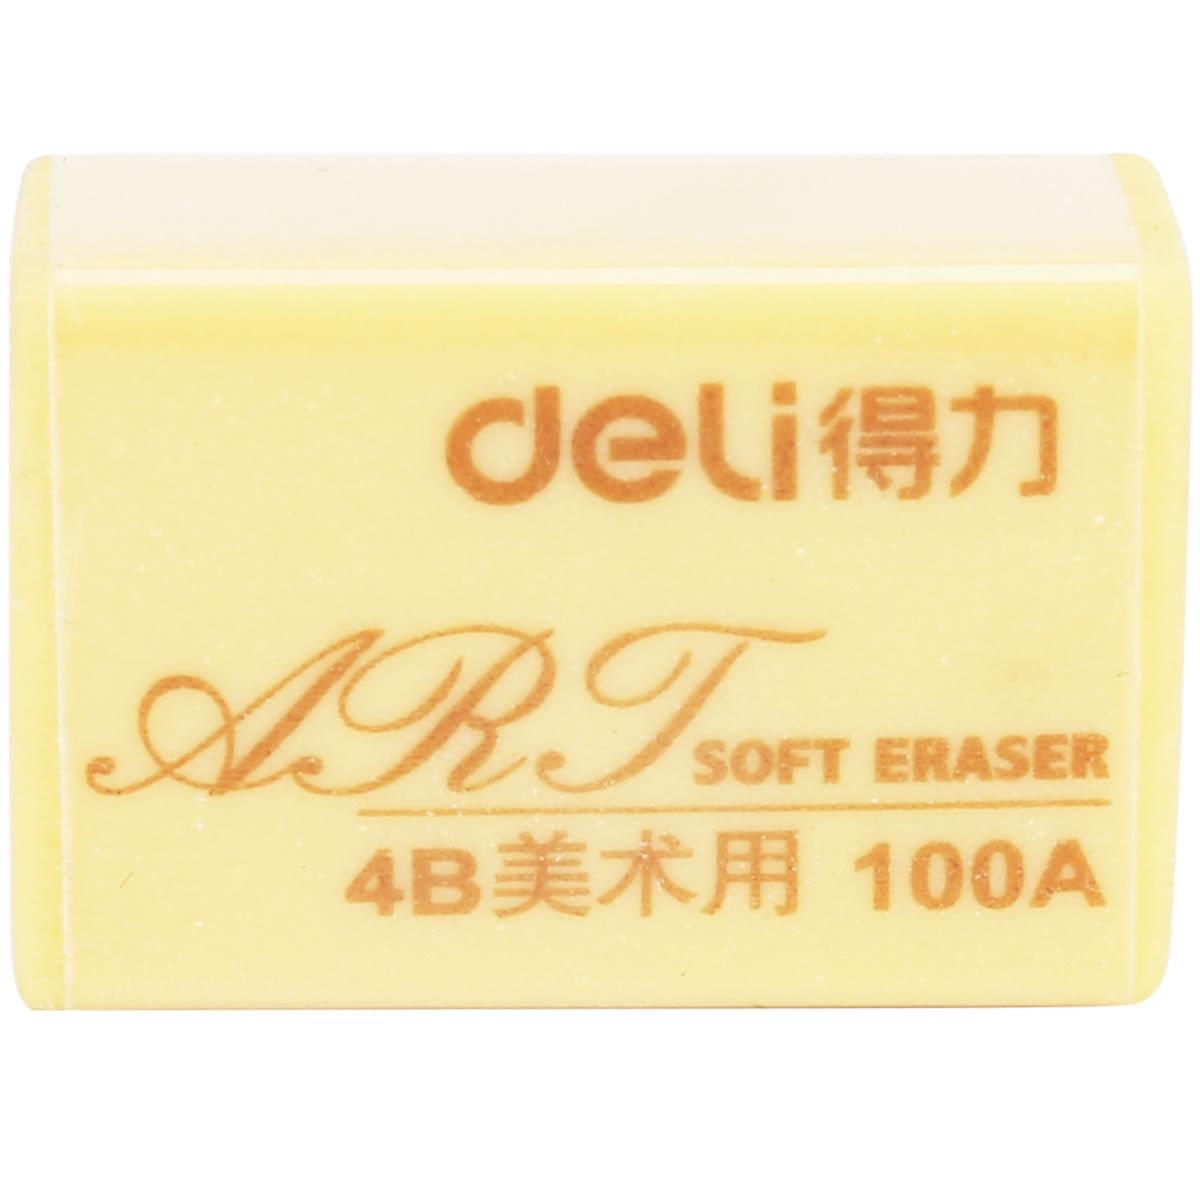 Deli Fine Art With Rubber Eraser 7534 Students Mapping Rubber 4B Rubber Fine Art Painted Rubber Wholesale